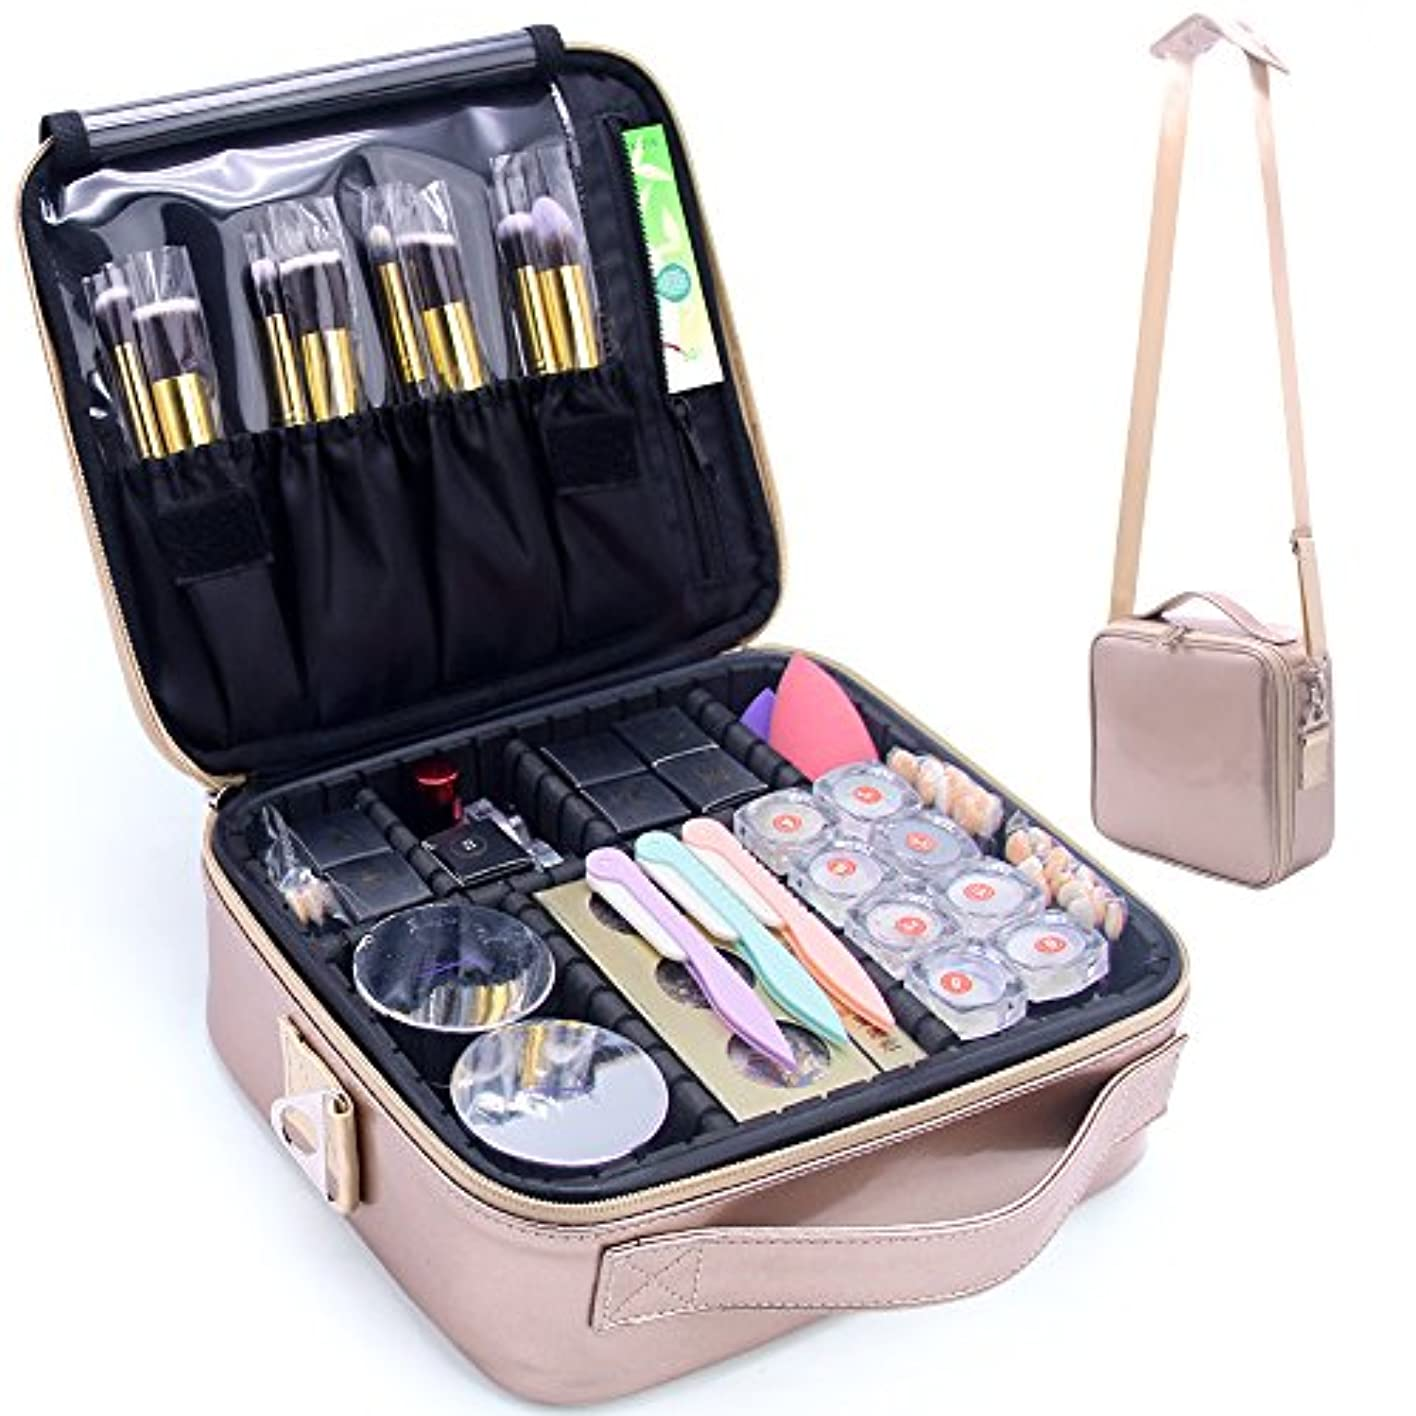 TANTO 化粧トラベルケース化粧ポーチトレインケース 調節可能 ショルダーストラップと化粧品ジュエリーエレクトロニクス 用 主催者およびストレージを構成します ローズゴールド